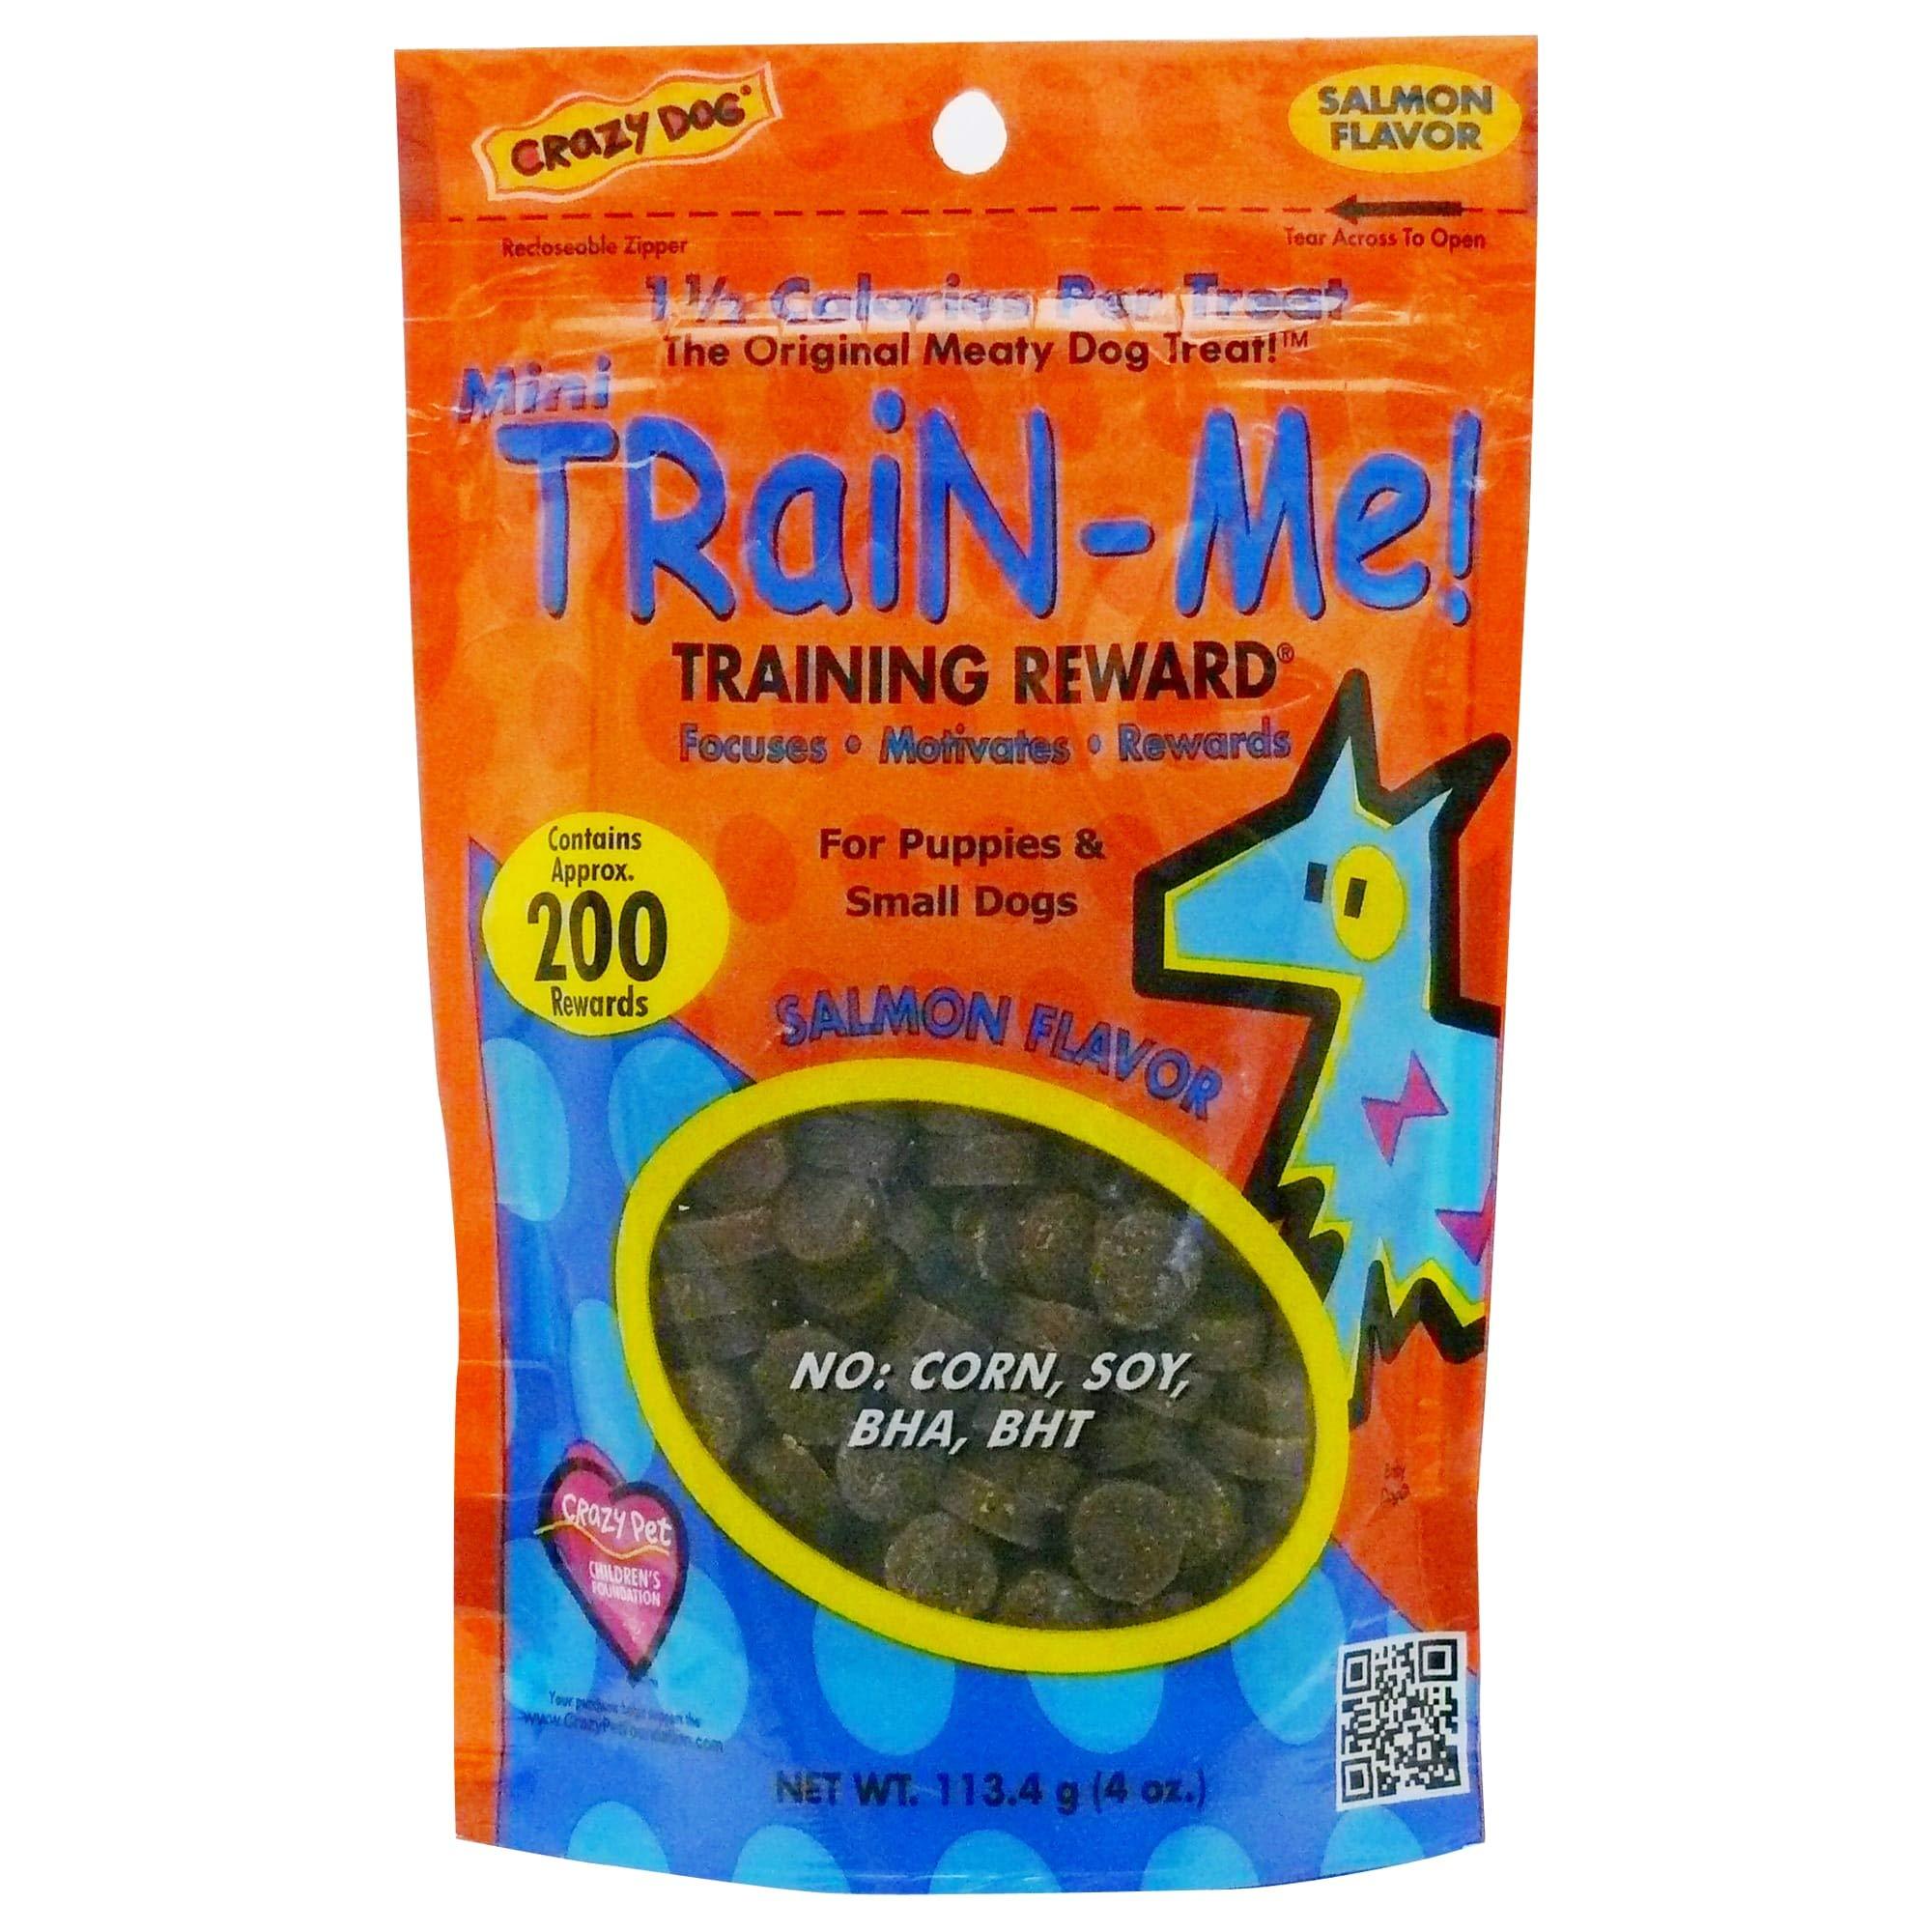 Crazy Dog Train-Me! Training Reward Dog Treats 16 Oz., Bacon Regular